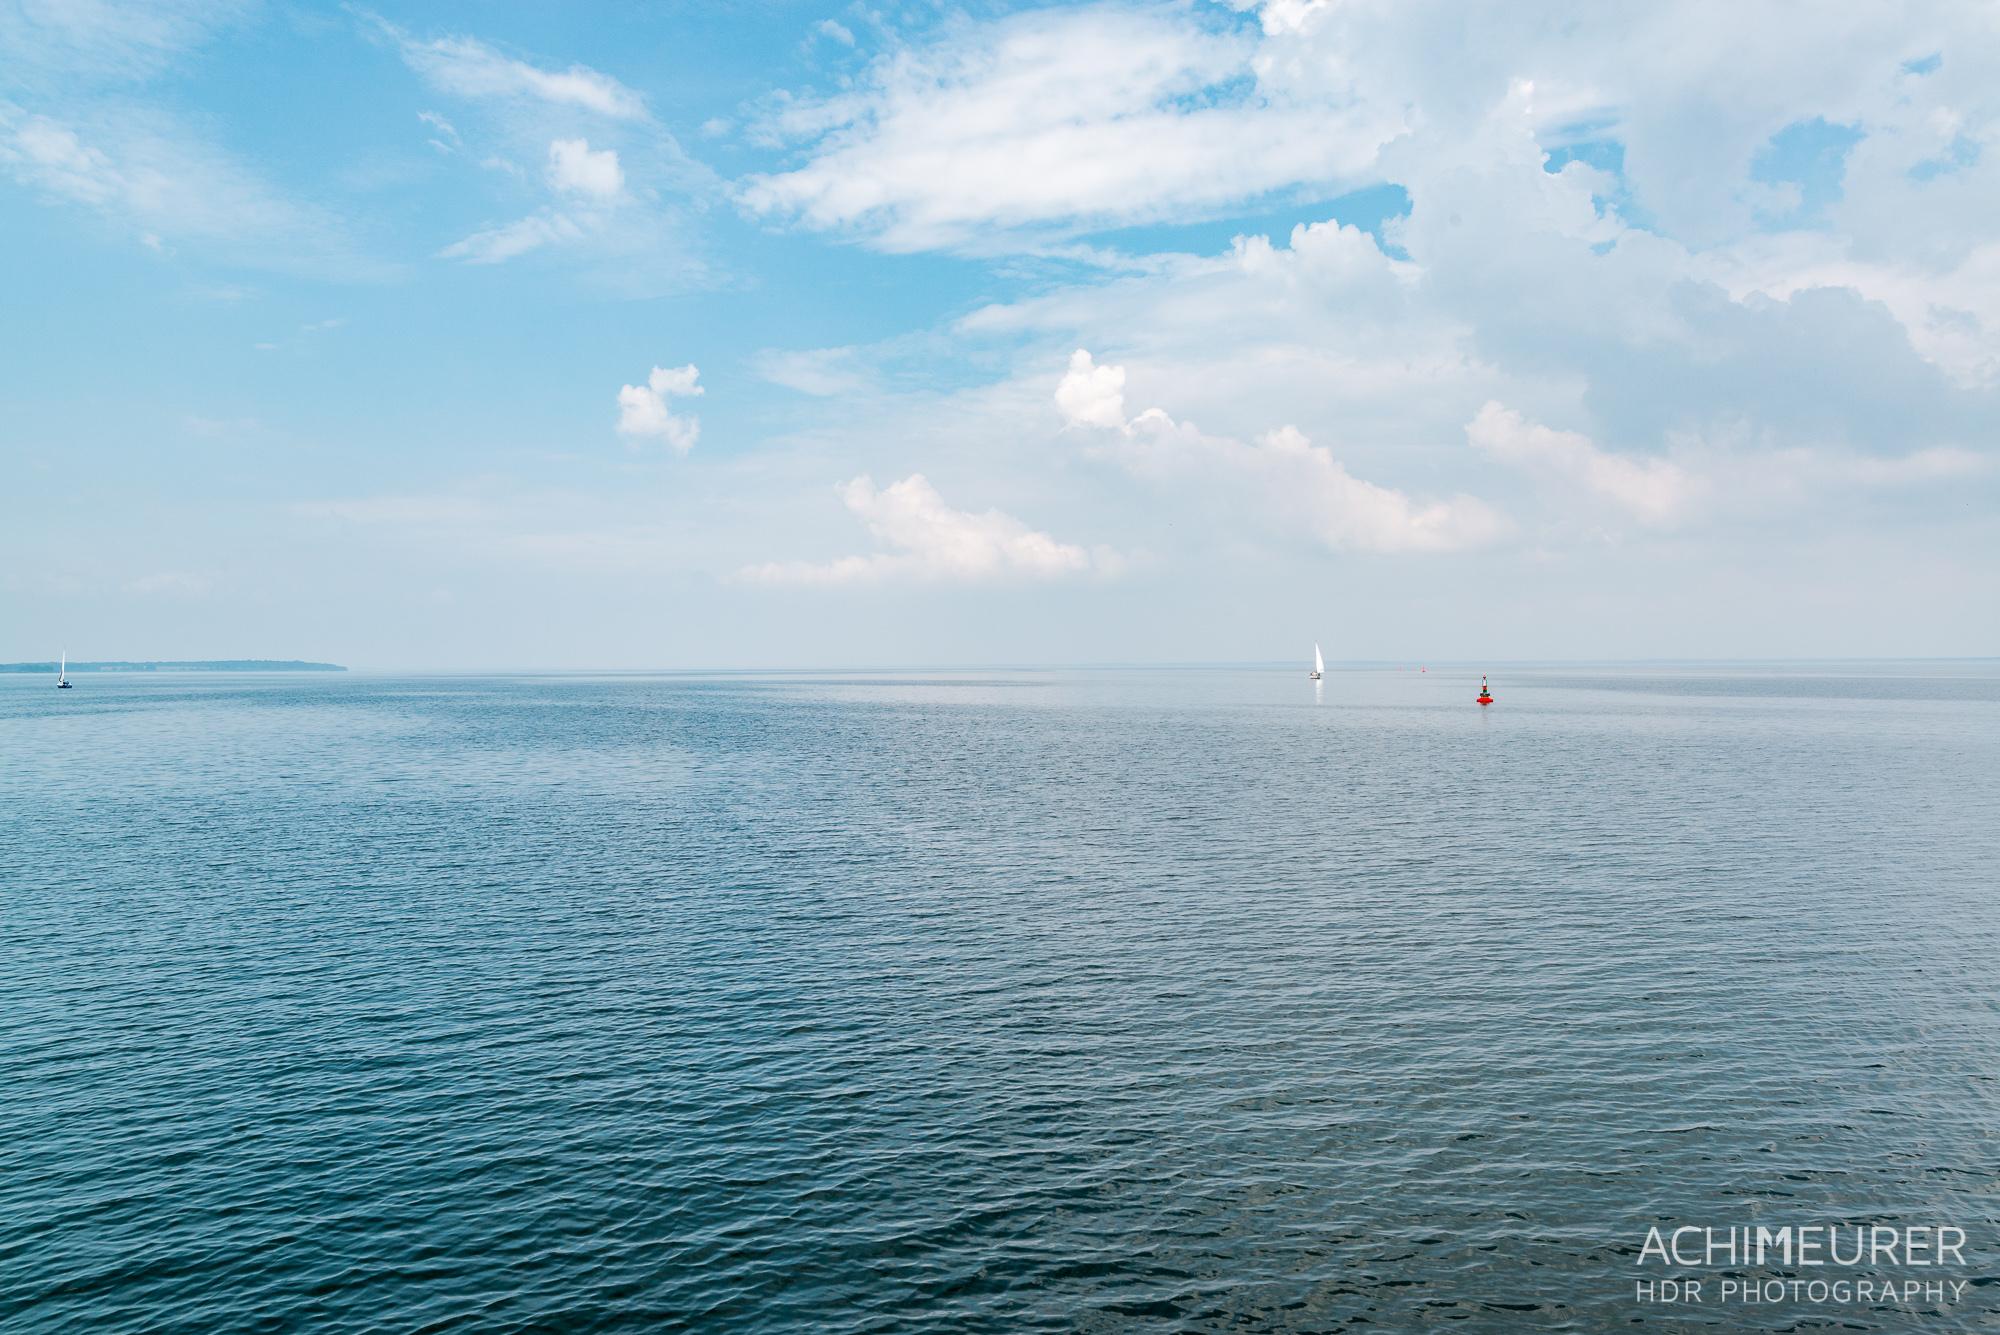 Hausboot-Kuhnle-Mueritz-Mecklenburg-Vorpommern-See_2546